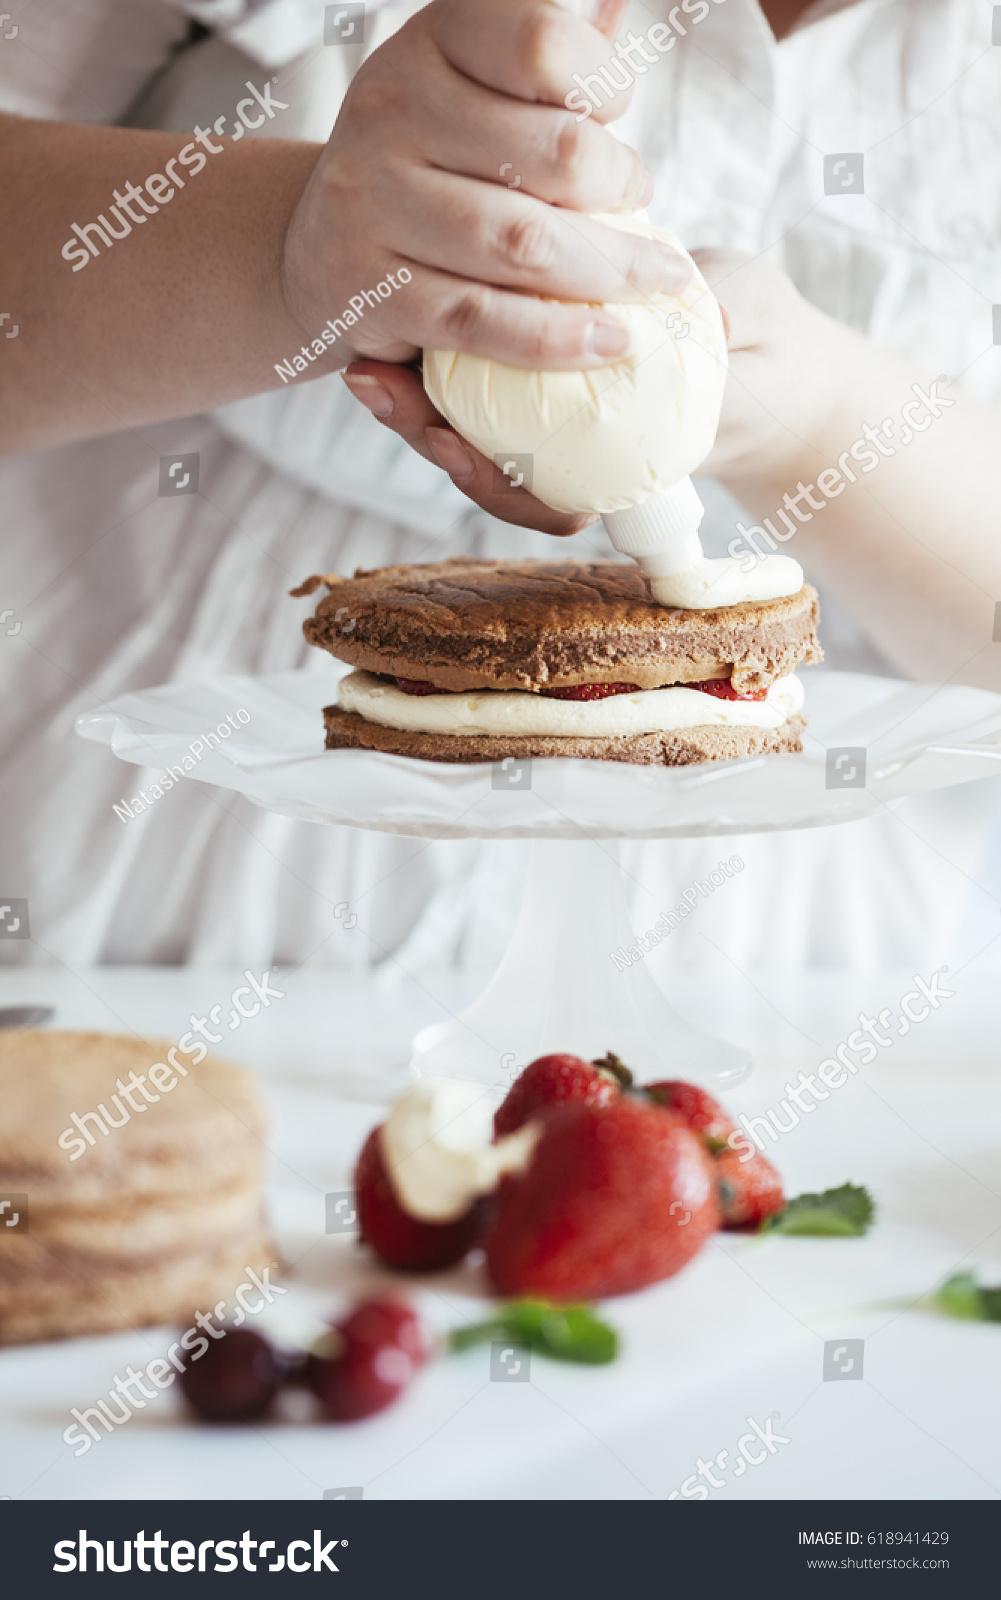 Woman Making Naked Cake Kitchen Stock Photo 618941429 - Shutterstock